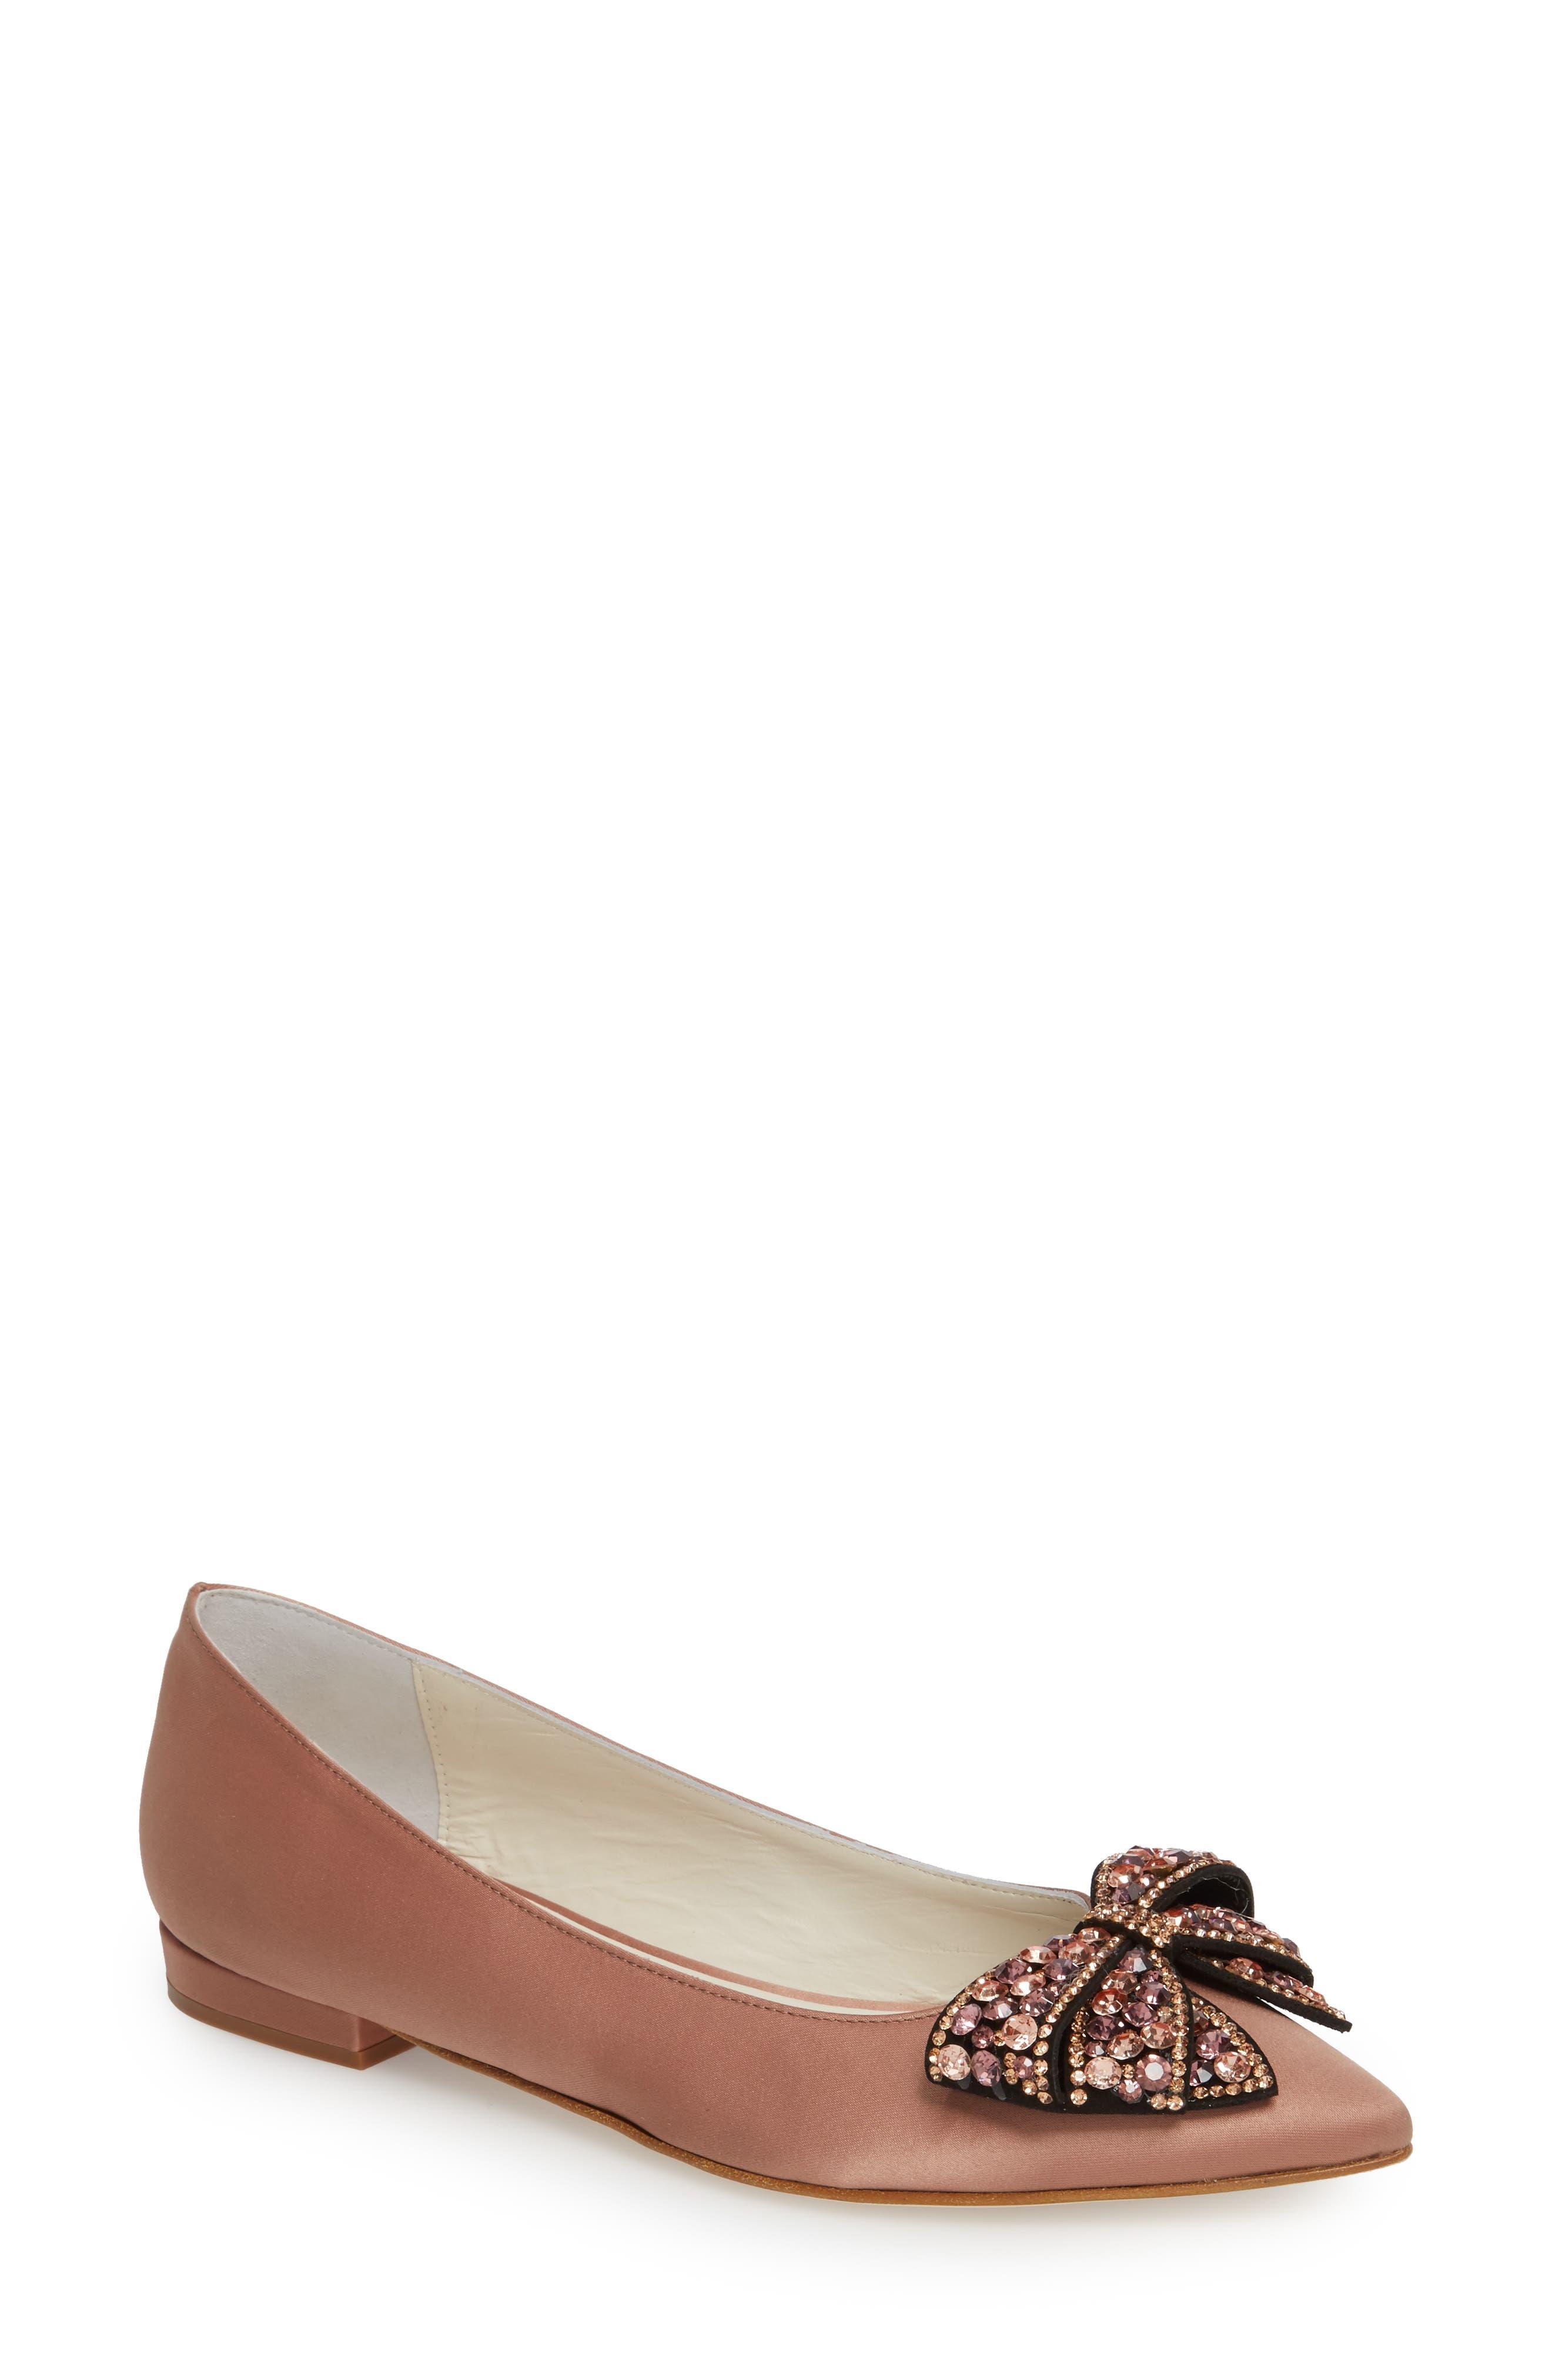 Milva Embellished Bow Pointy Toe Flat,                             Main thumbnail 1, color,                             Blush Satin